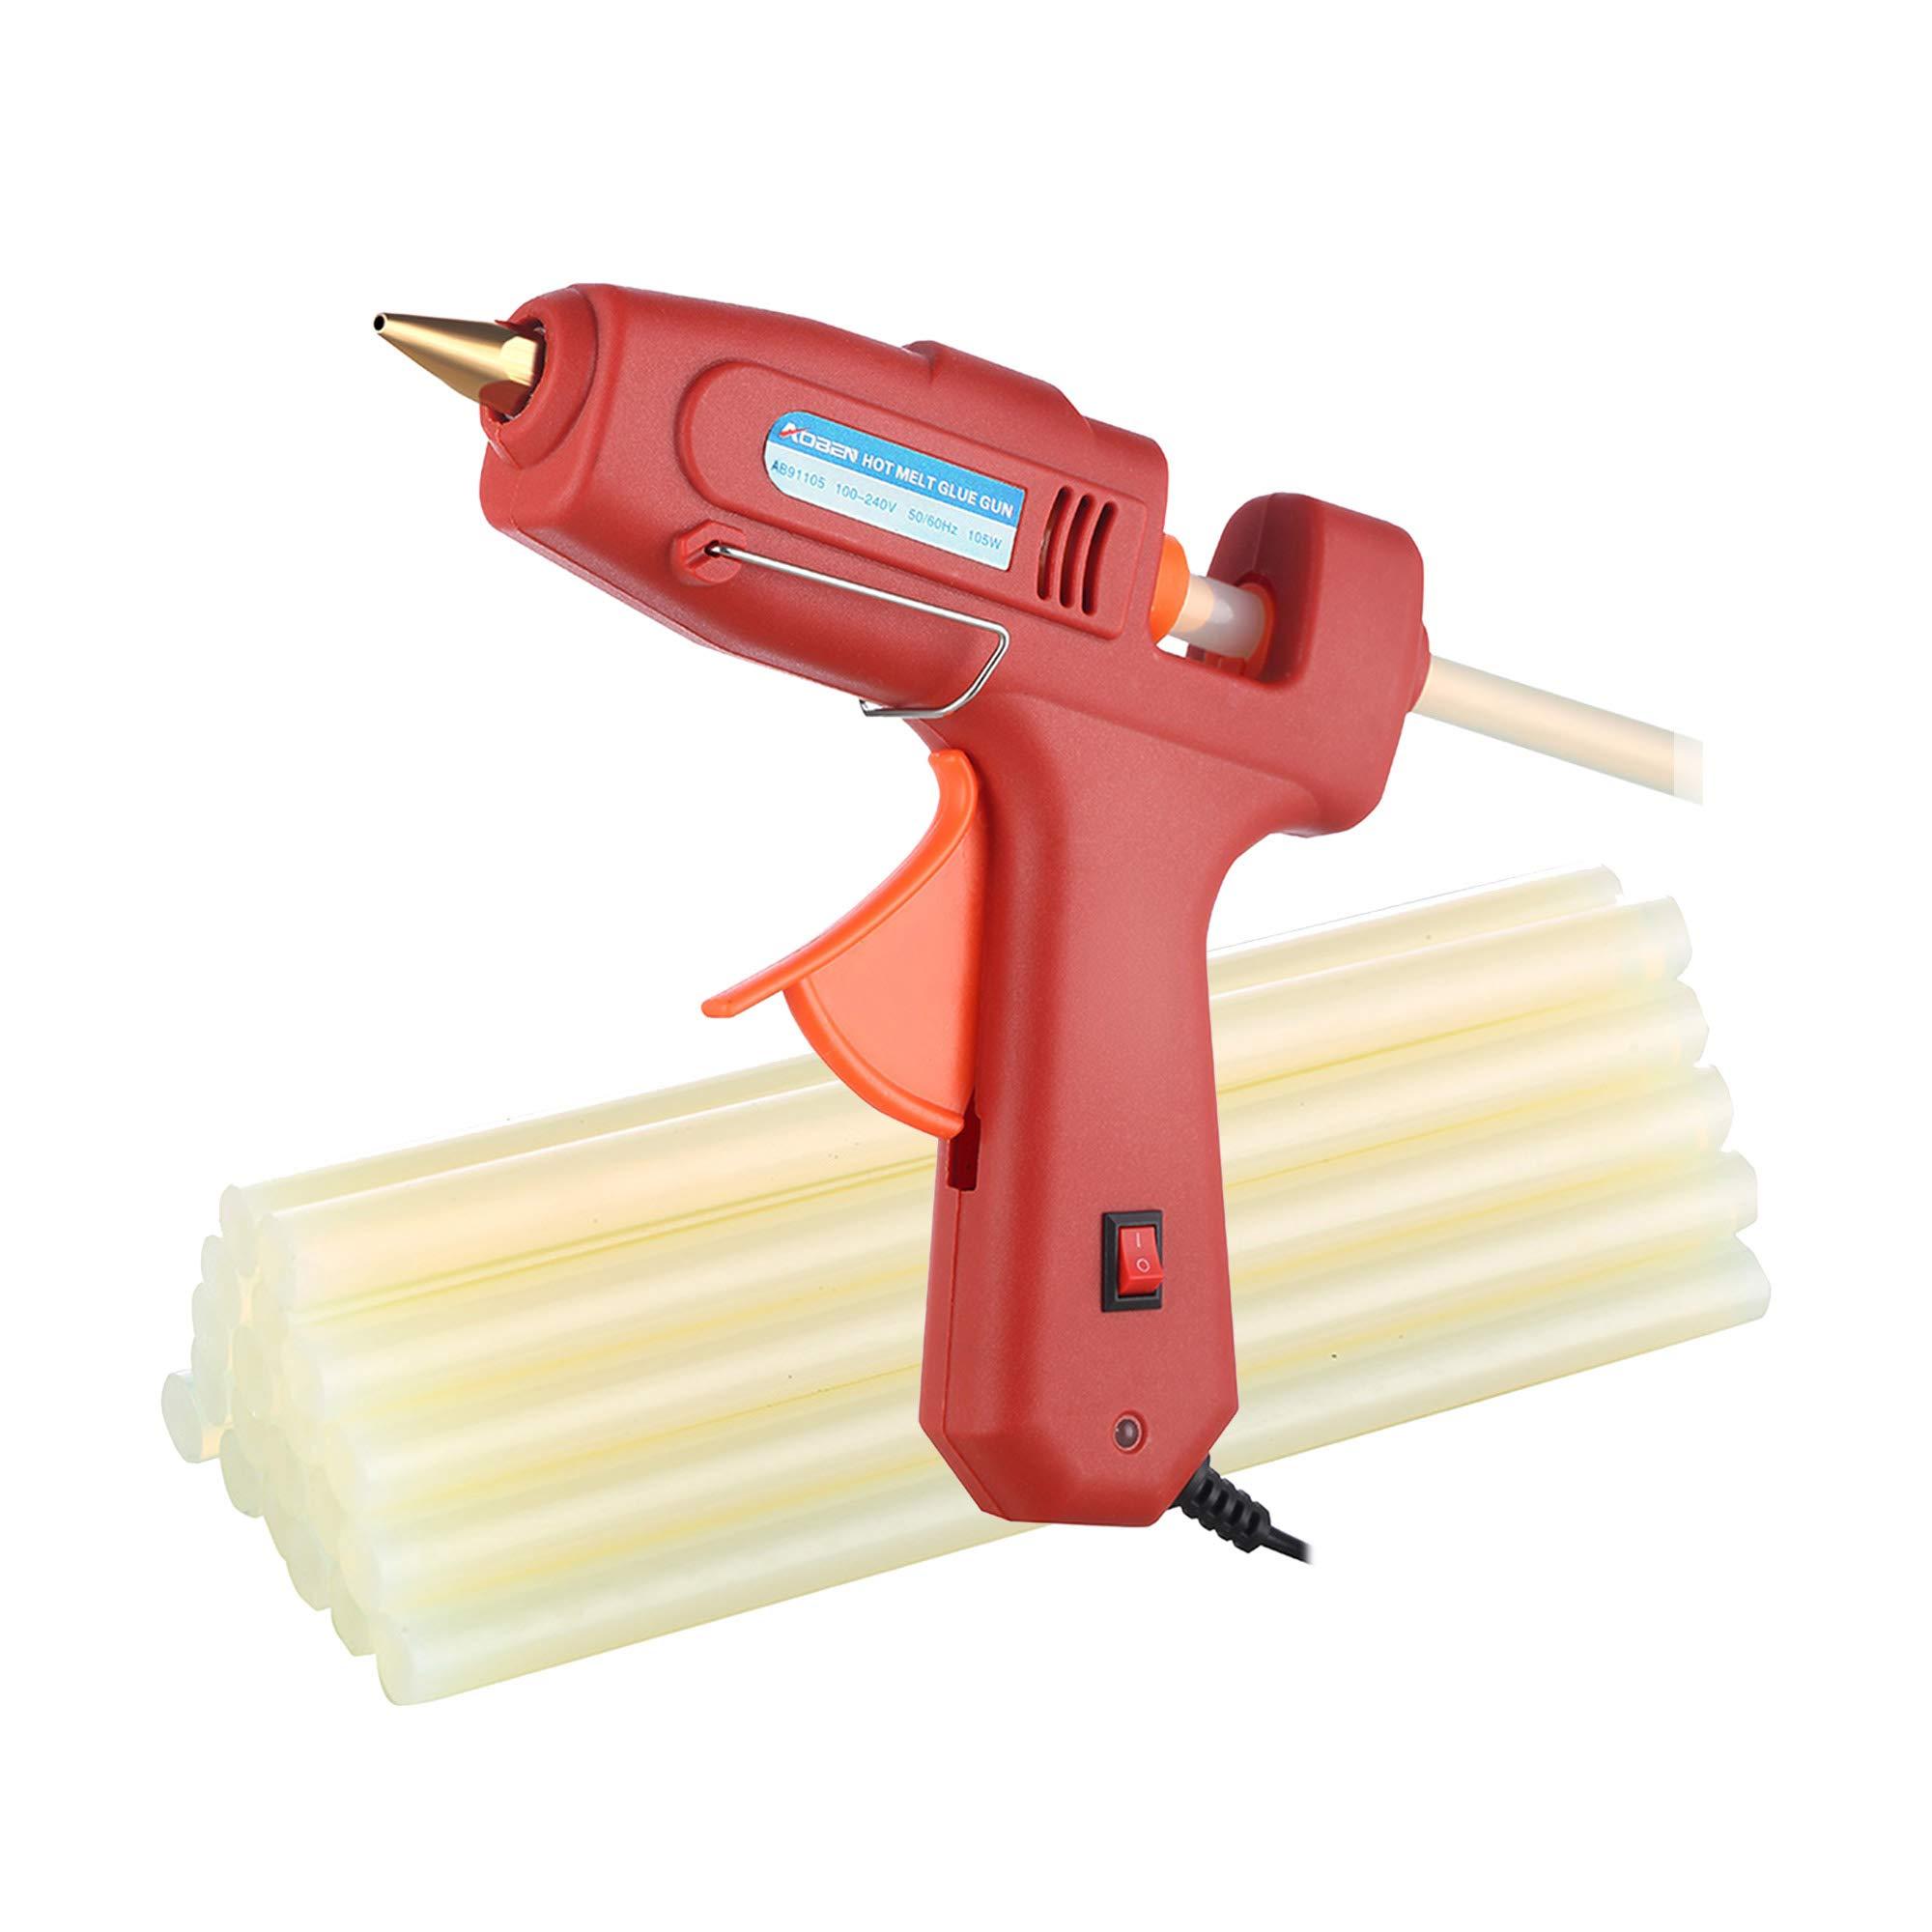 Hot Glue Gun, AOBEN Mini Craft Melt Glue Gun Kit with 20pcs Glue Sticks for DIY Small Craft Projects, Arts, Sealing and Quick Repairs, Red (105W)